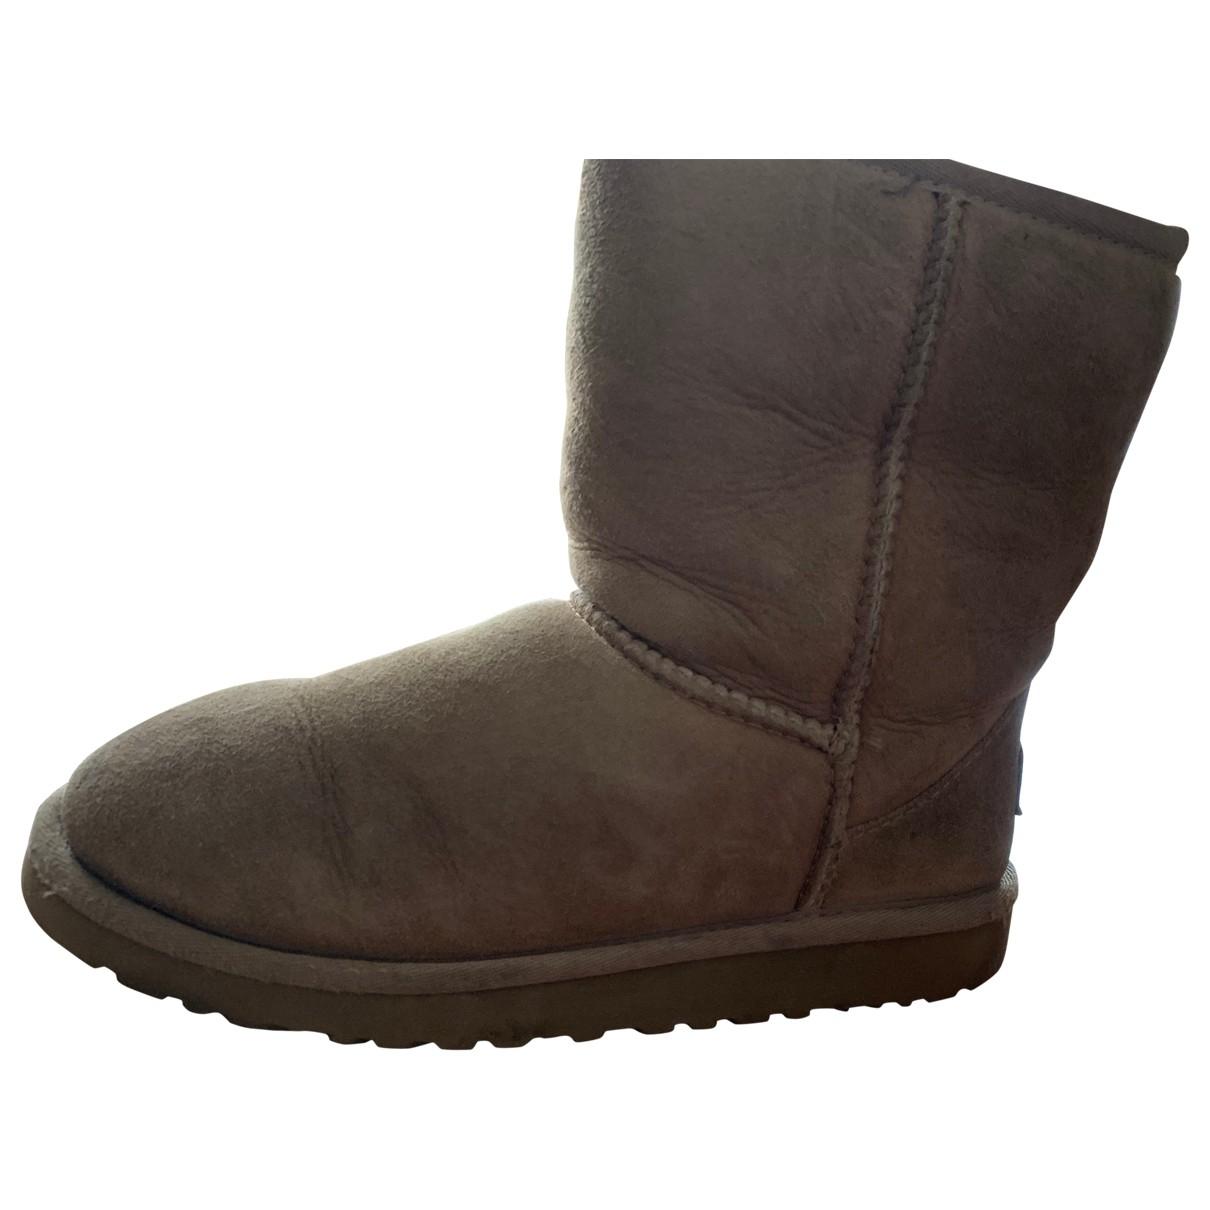 Hugo Boss \N Beige Suede Boots for Kids 32 EU